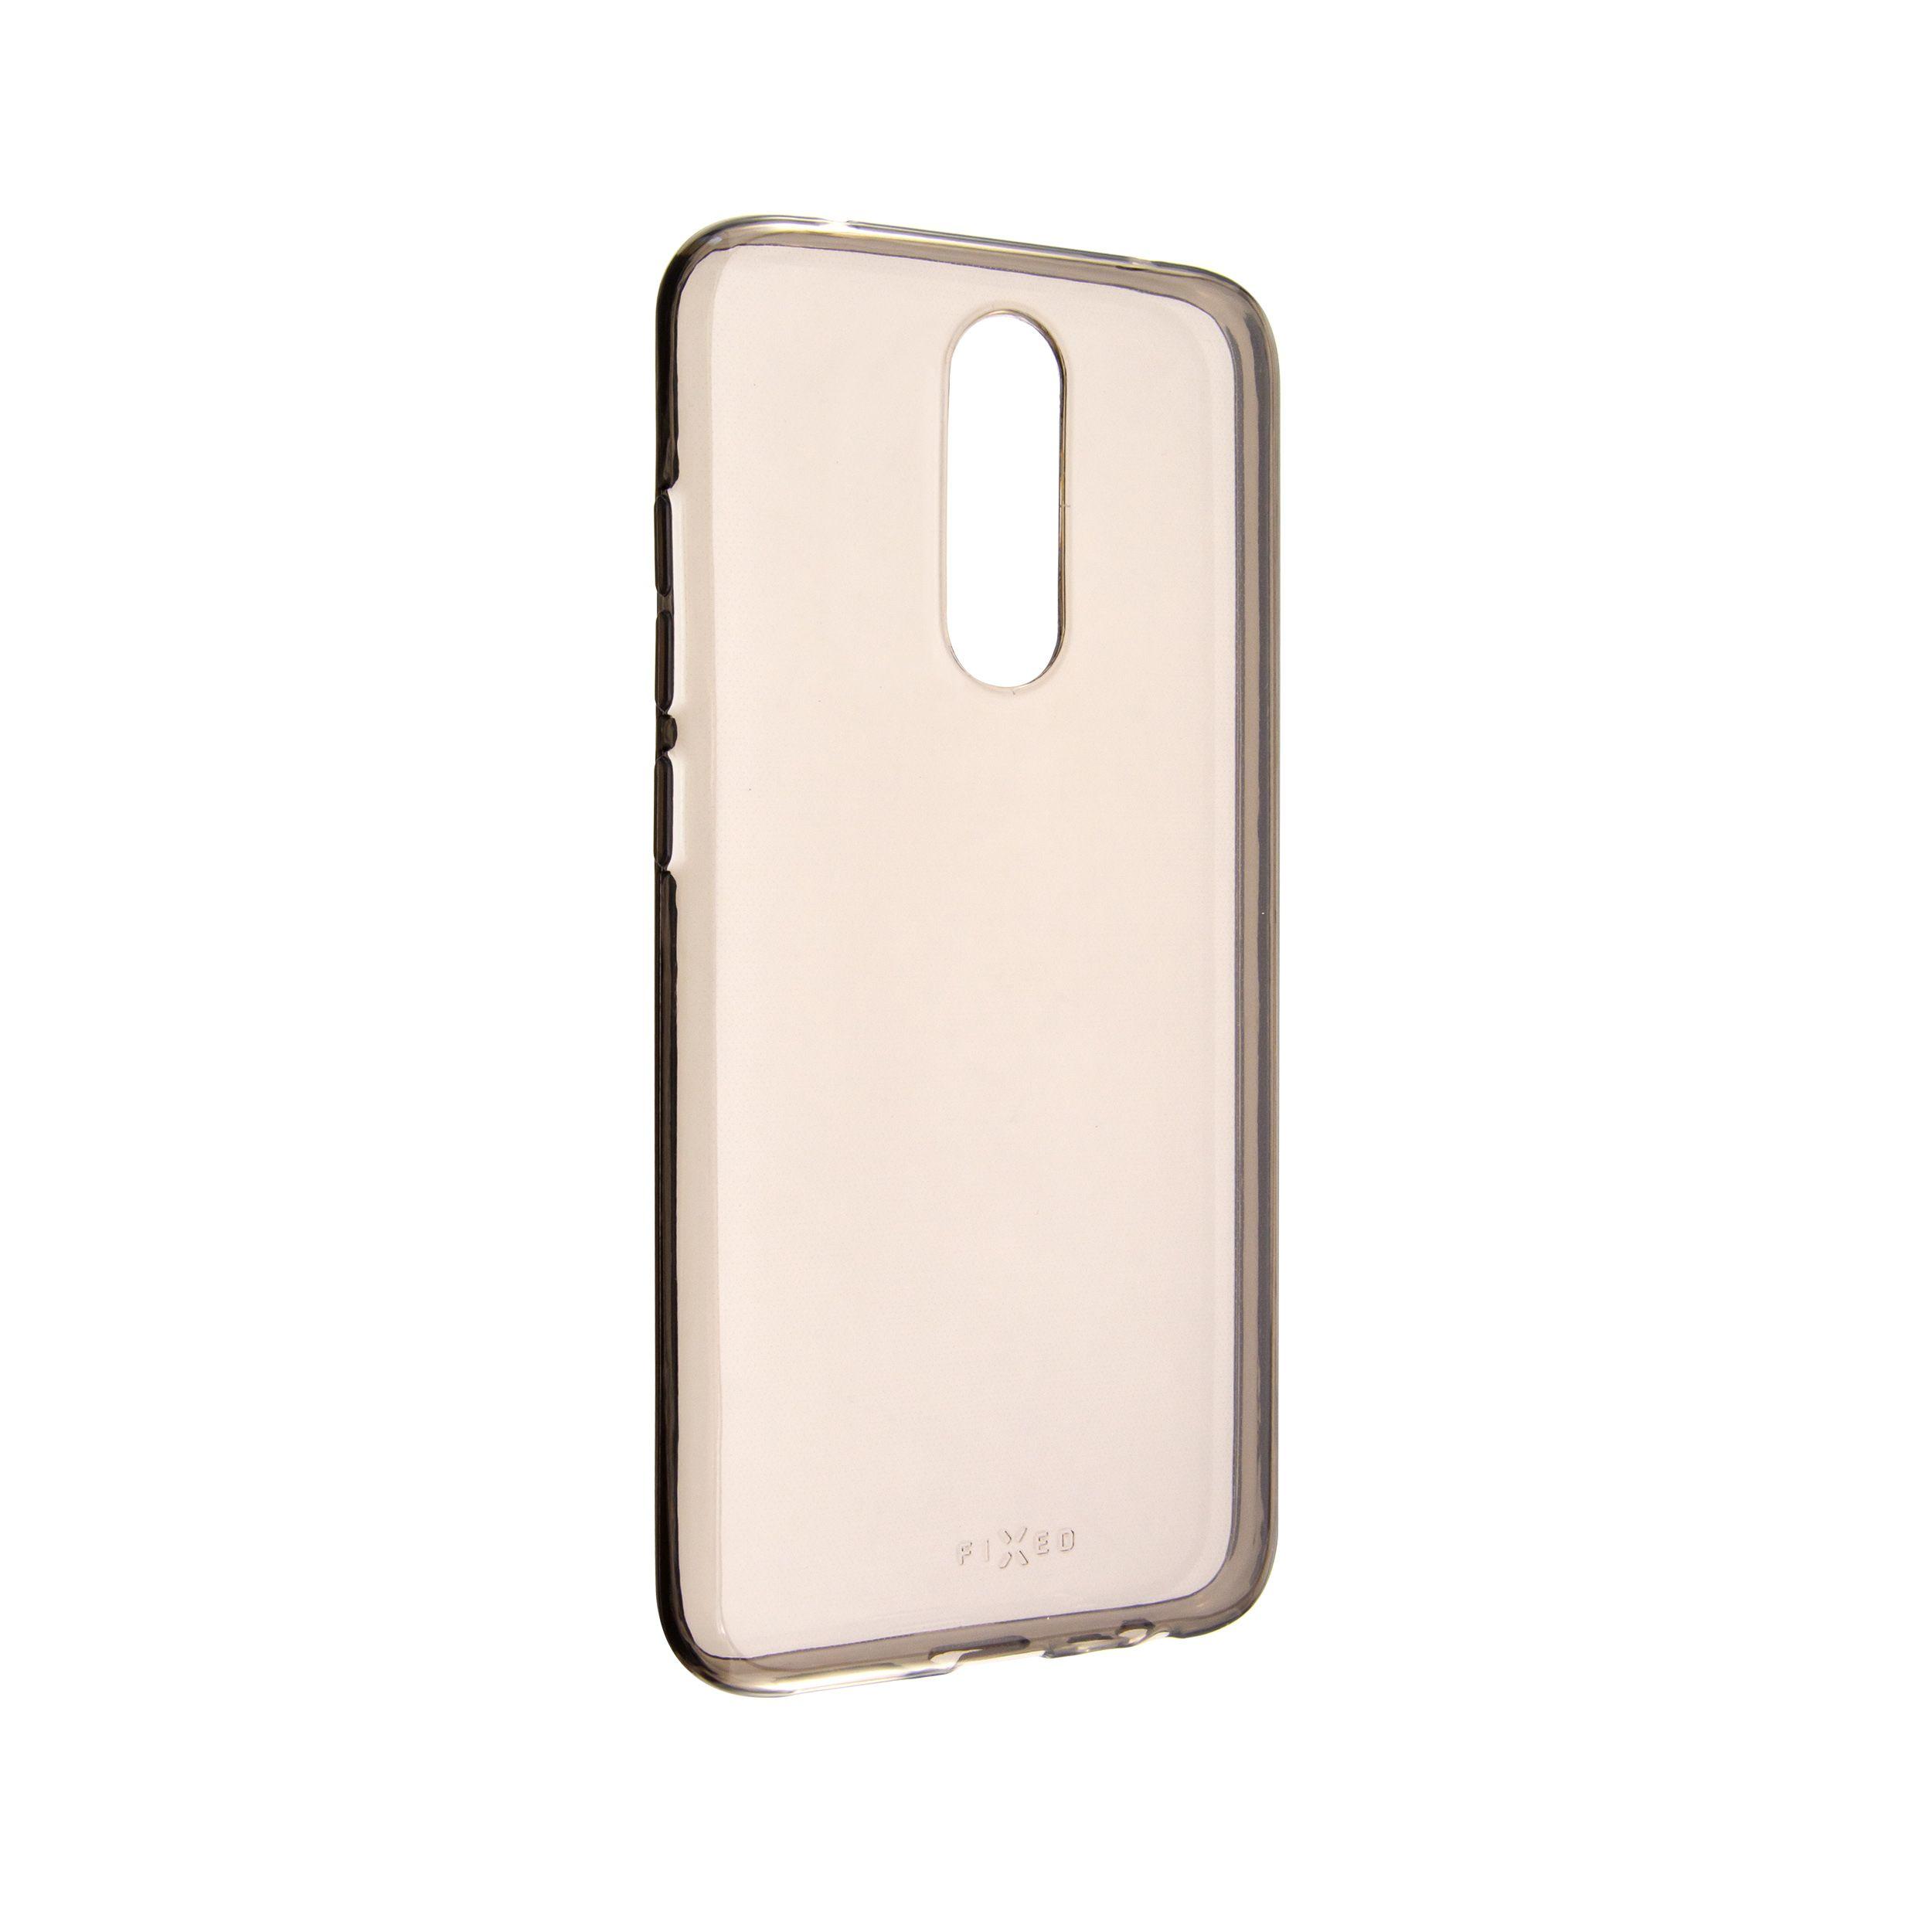 TPU gelové pouzdro FIXED Slim pro Xiaomi Redmi 8, 0,6 mm, kouřové